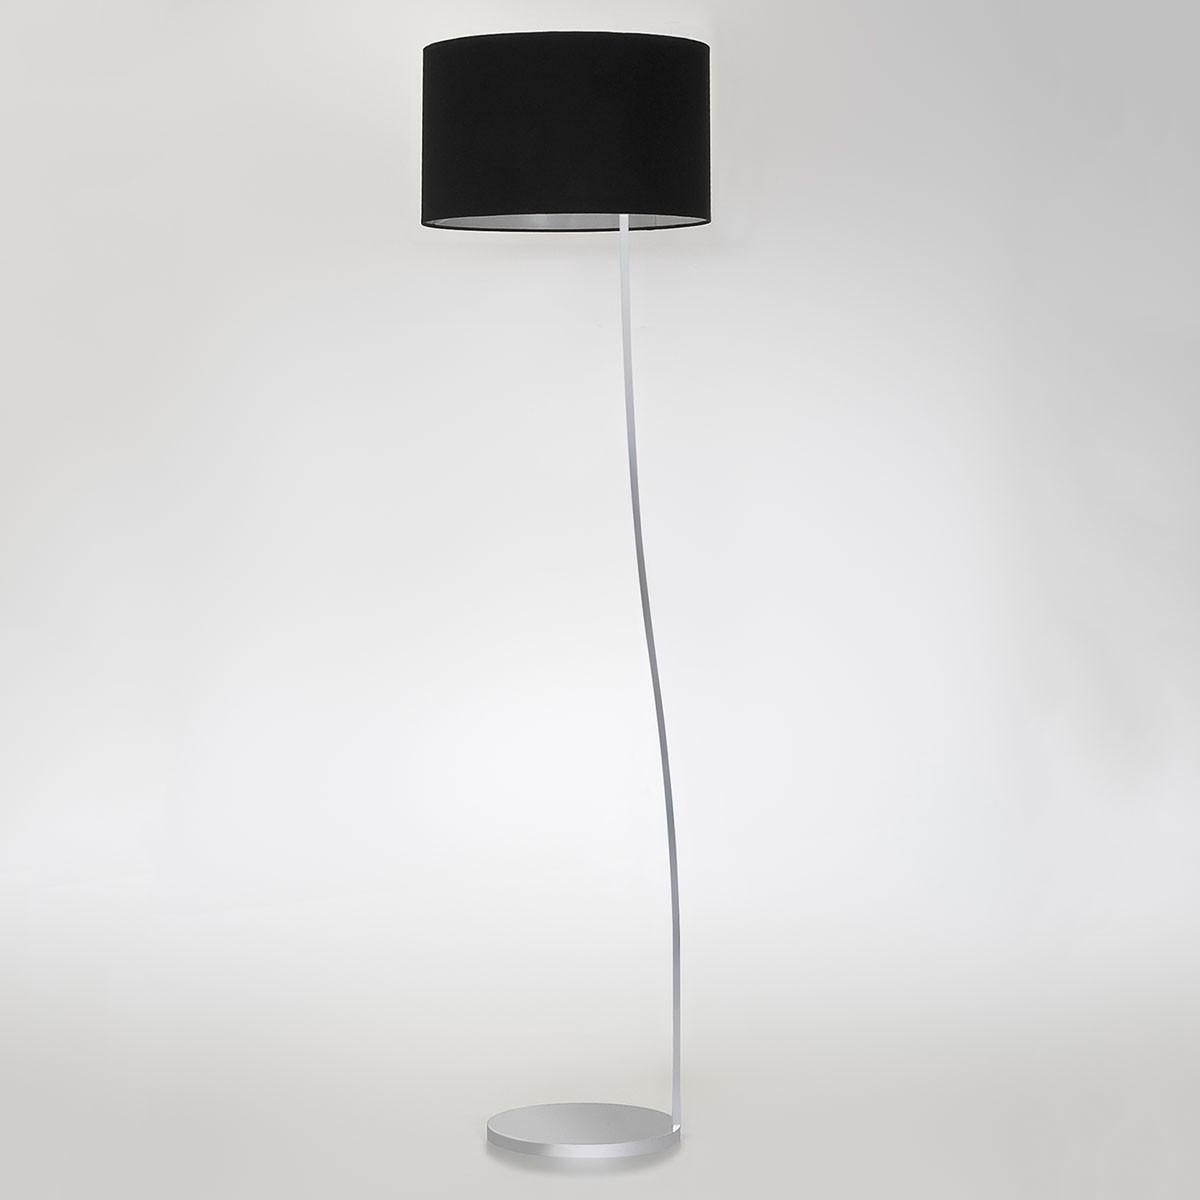 Astro Sofia Matt Nickel Floor Lamp at UK Electrical Supplies.